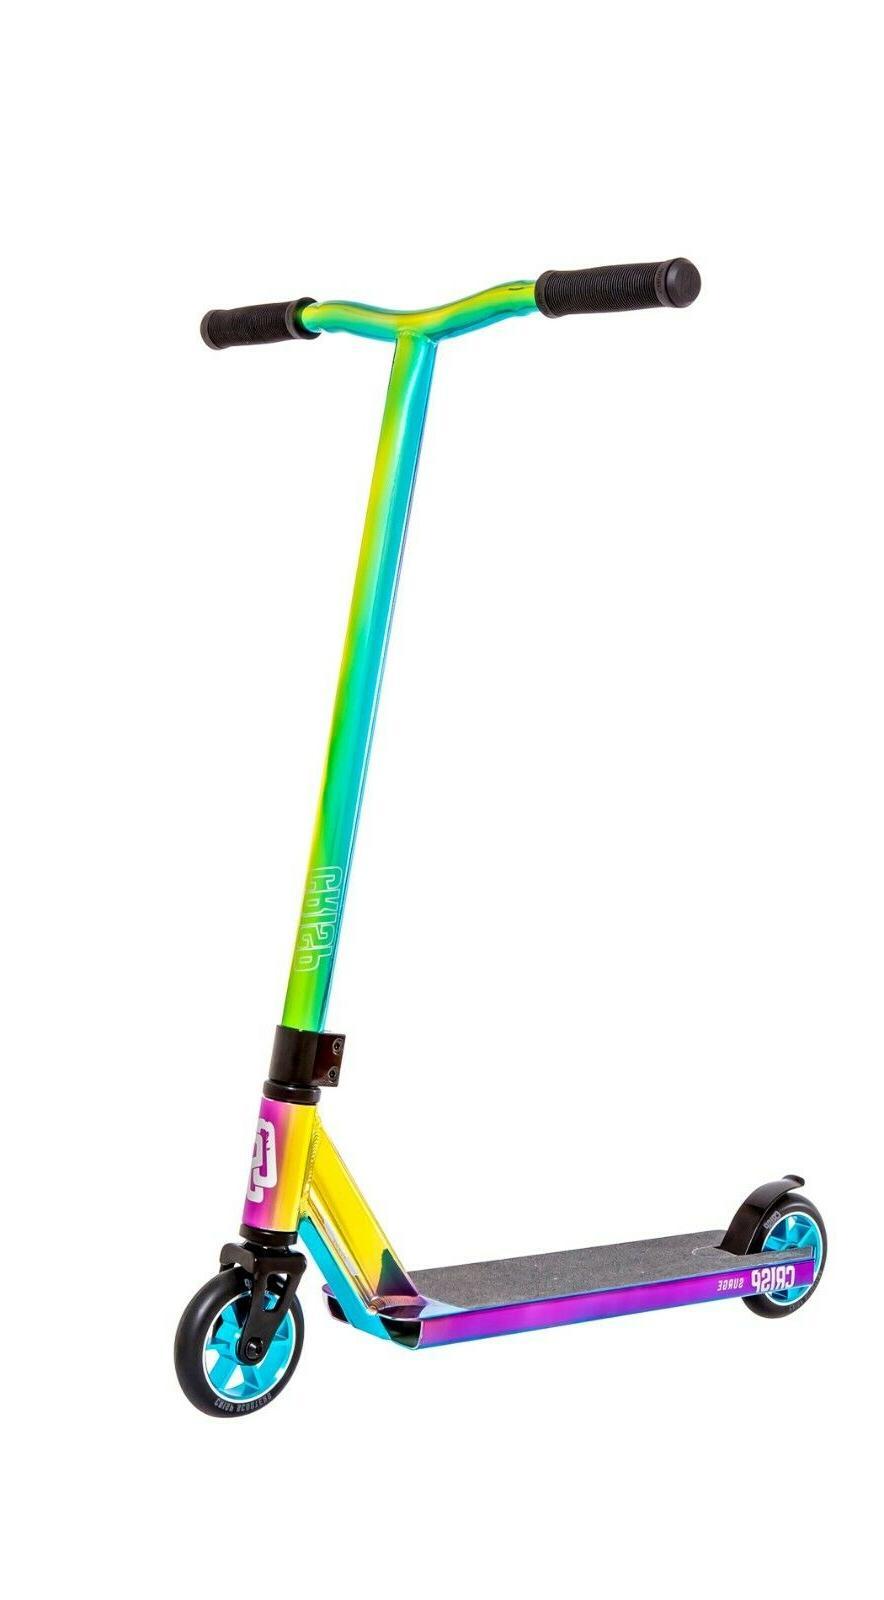 crisp surge pro scooter chrome blue green